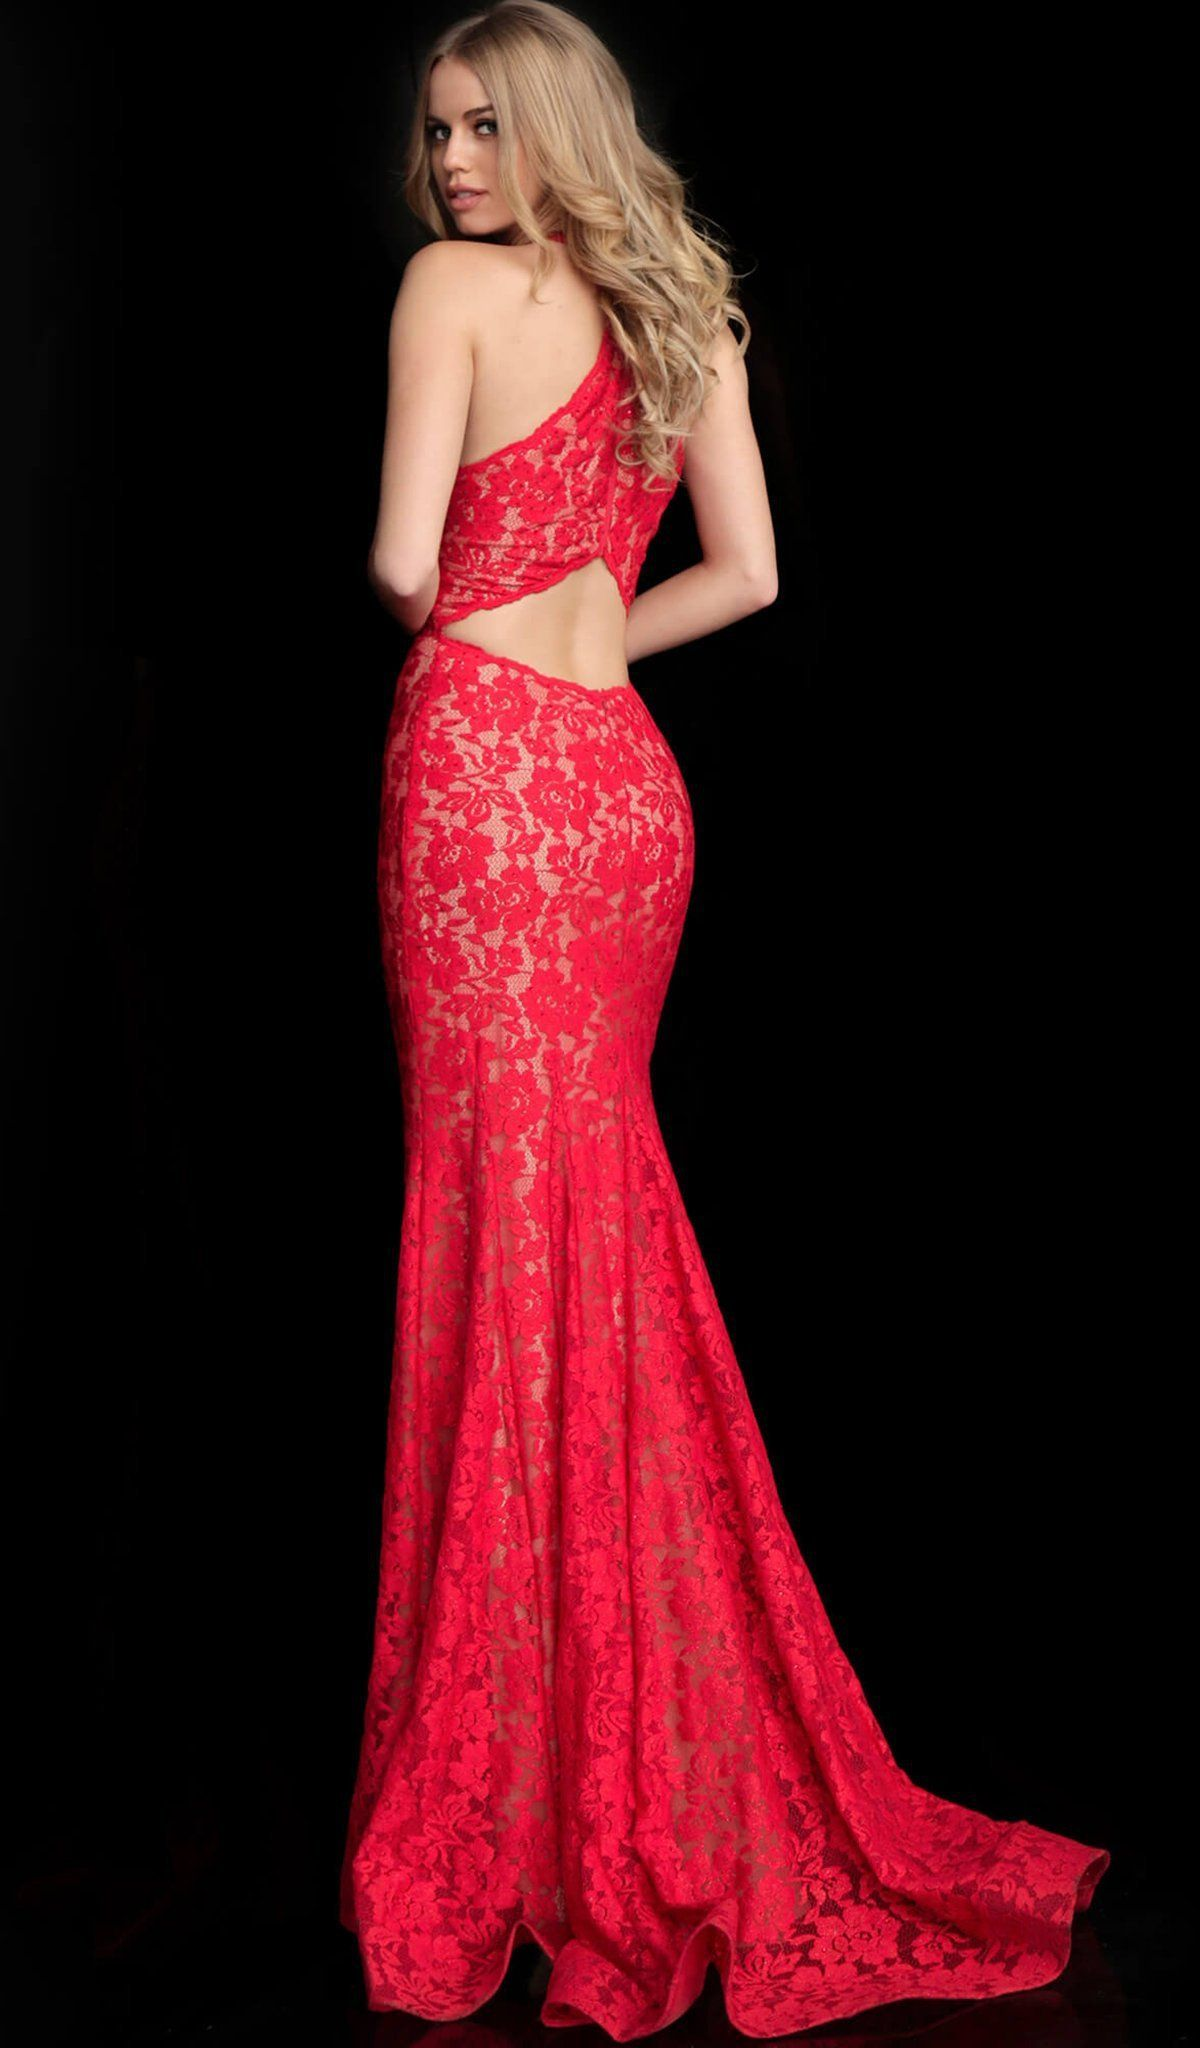 Jovani 63214 Embellished Lace Halter Trumpet Dress Form Fitting Prom Dresses Prom Dresses Sleeveless Fitted Prom Dresses